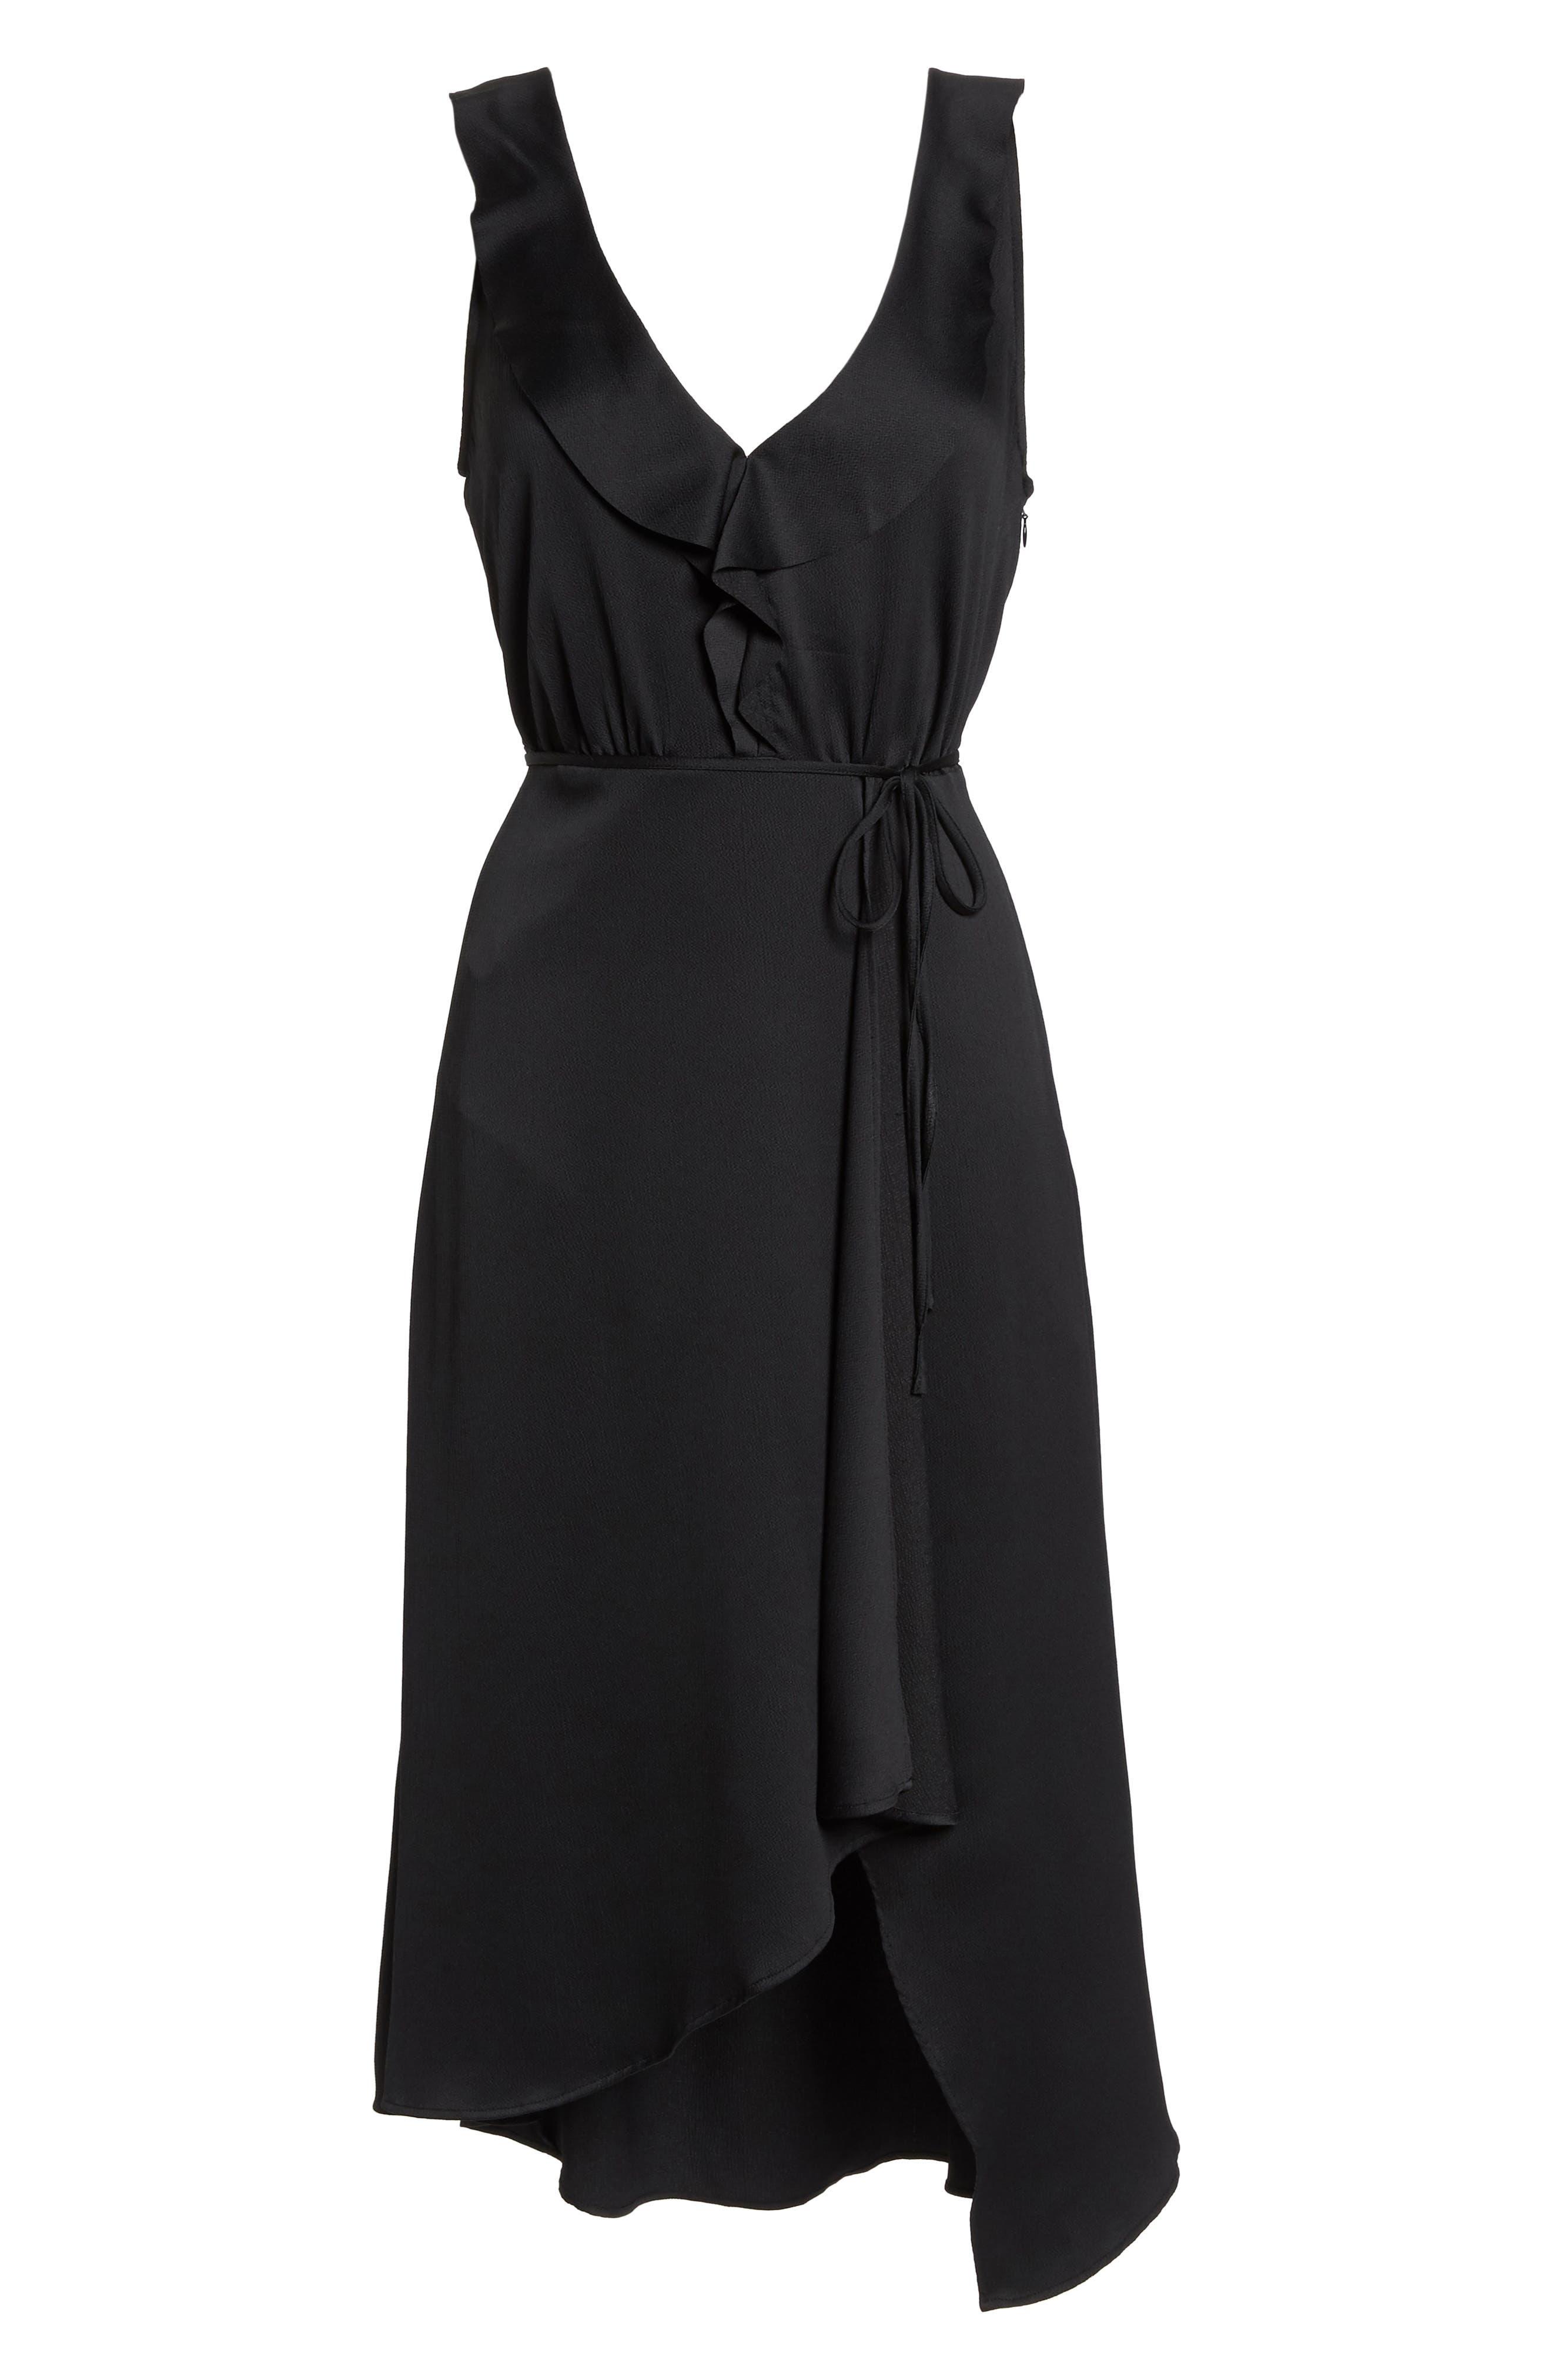 Maudie Ruffle Midi Dress,                             Alternate thumbnail 7, color,                             001